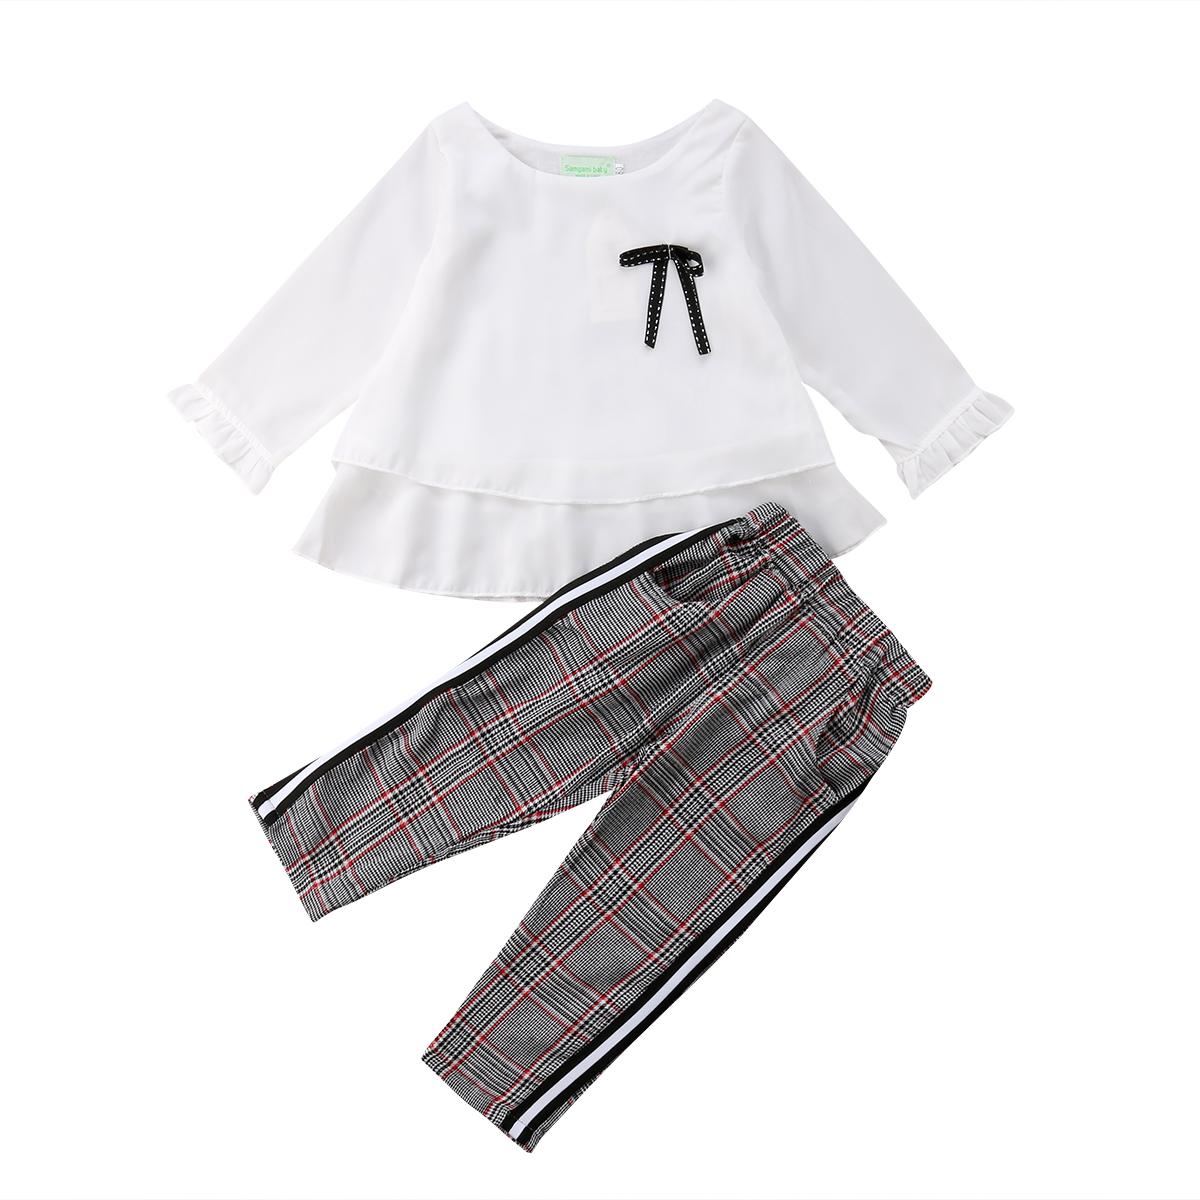 6c181fa04 2019 Girl Suits Toddler Kid Baby Girl White Chiffon Tops T Shirt+ ...